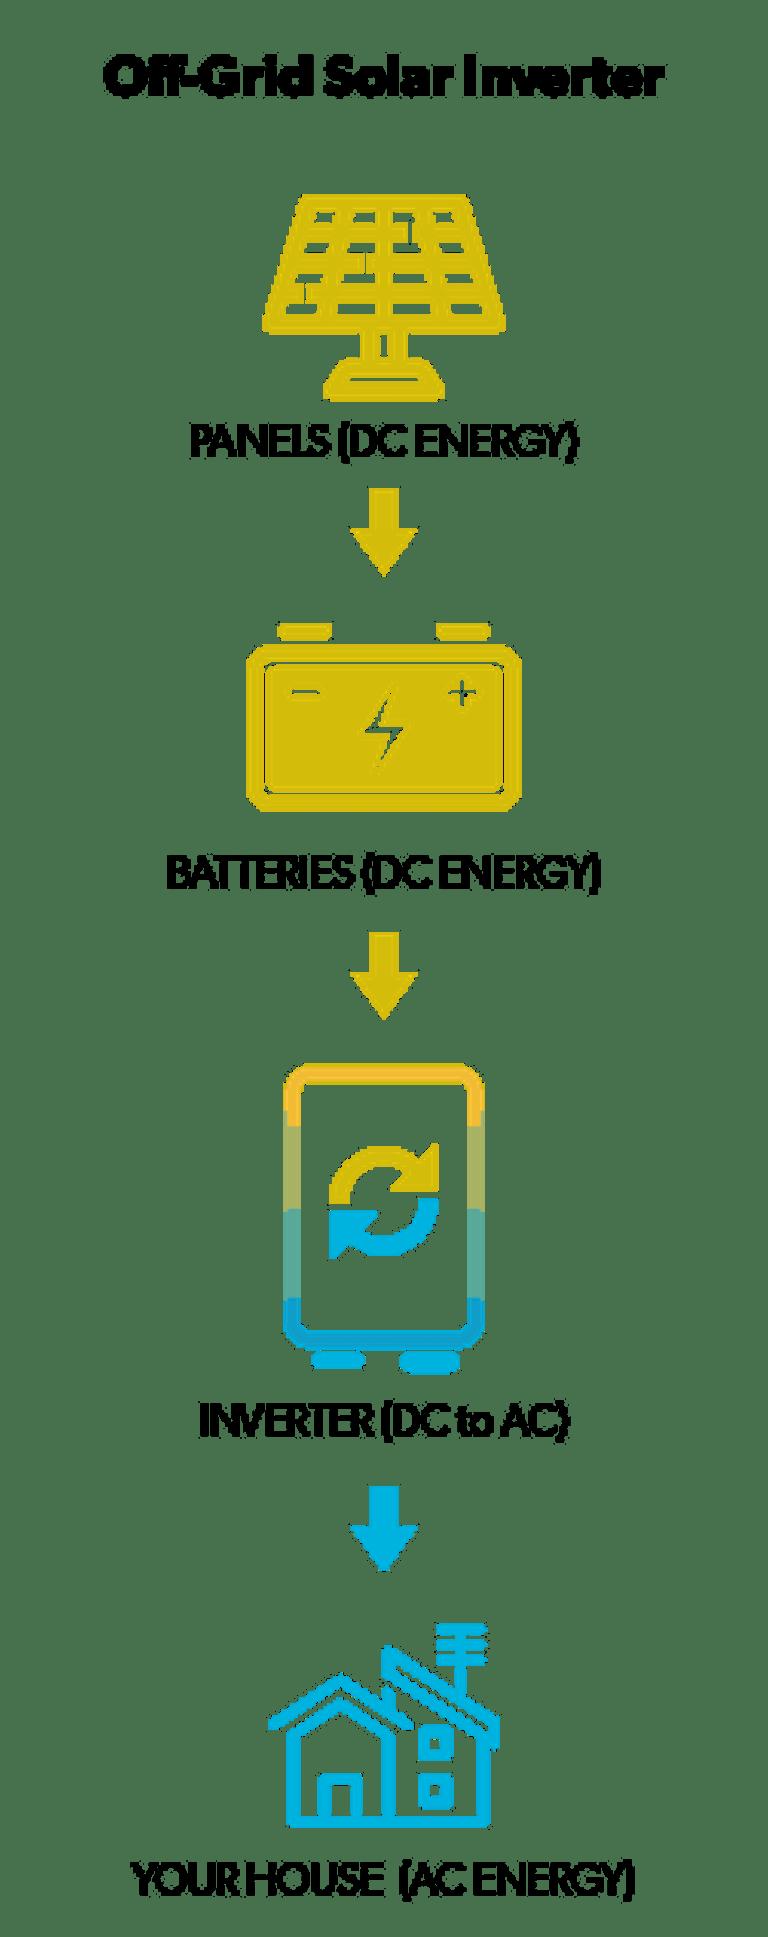 How an off-grid solar inverter works